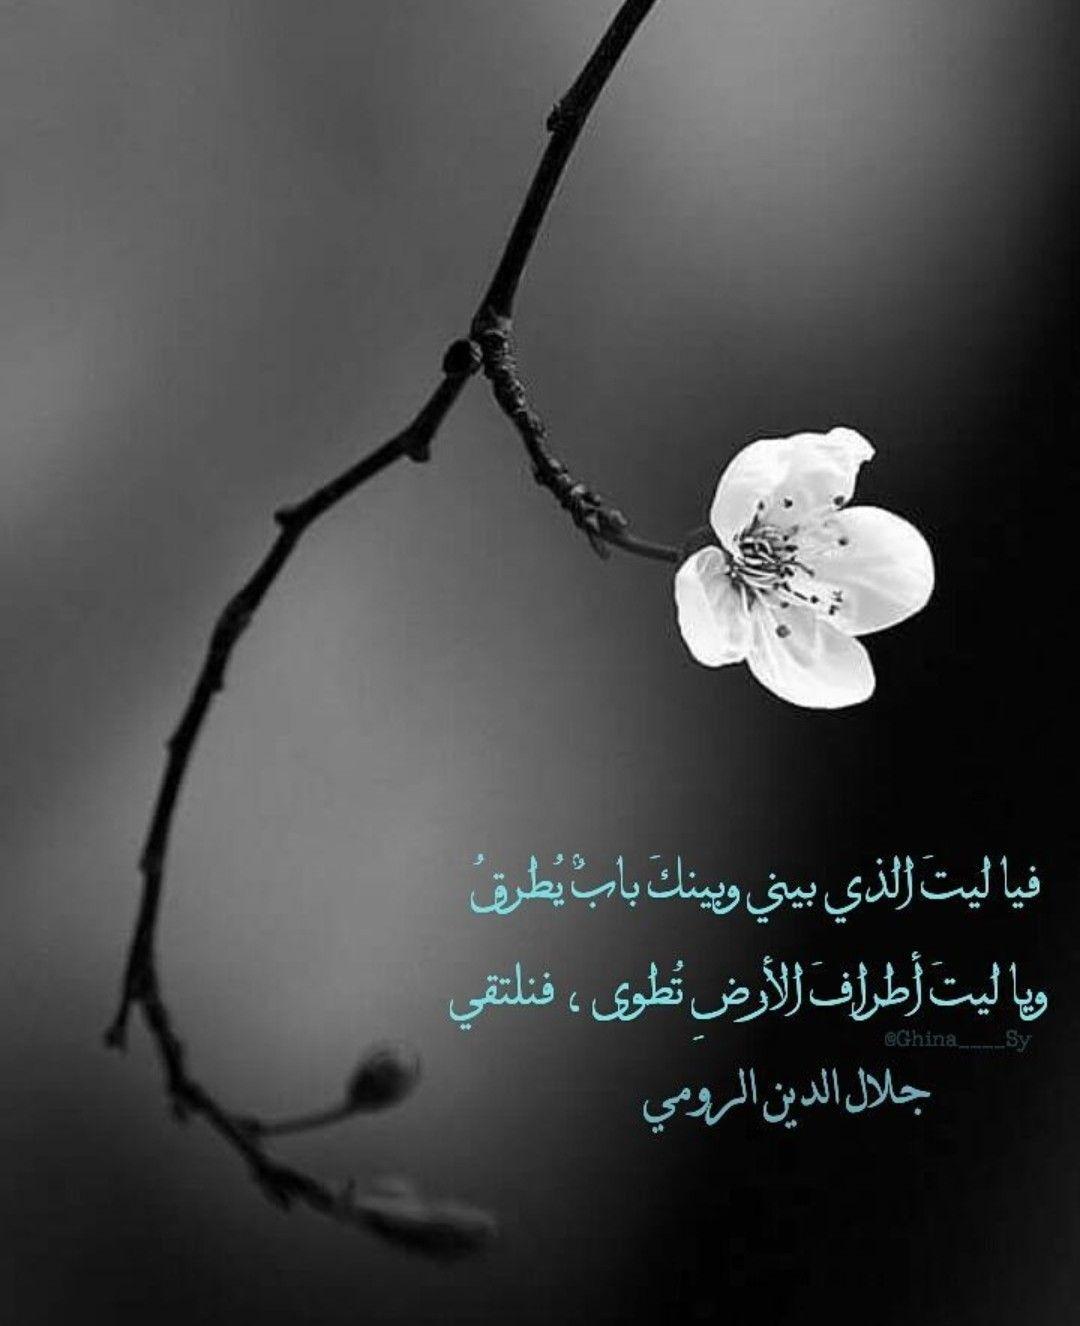 ياااليت جلال الدين الرومي Photo Quotes Arabic Quotes Love Quotes